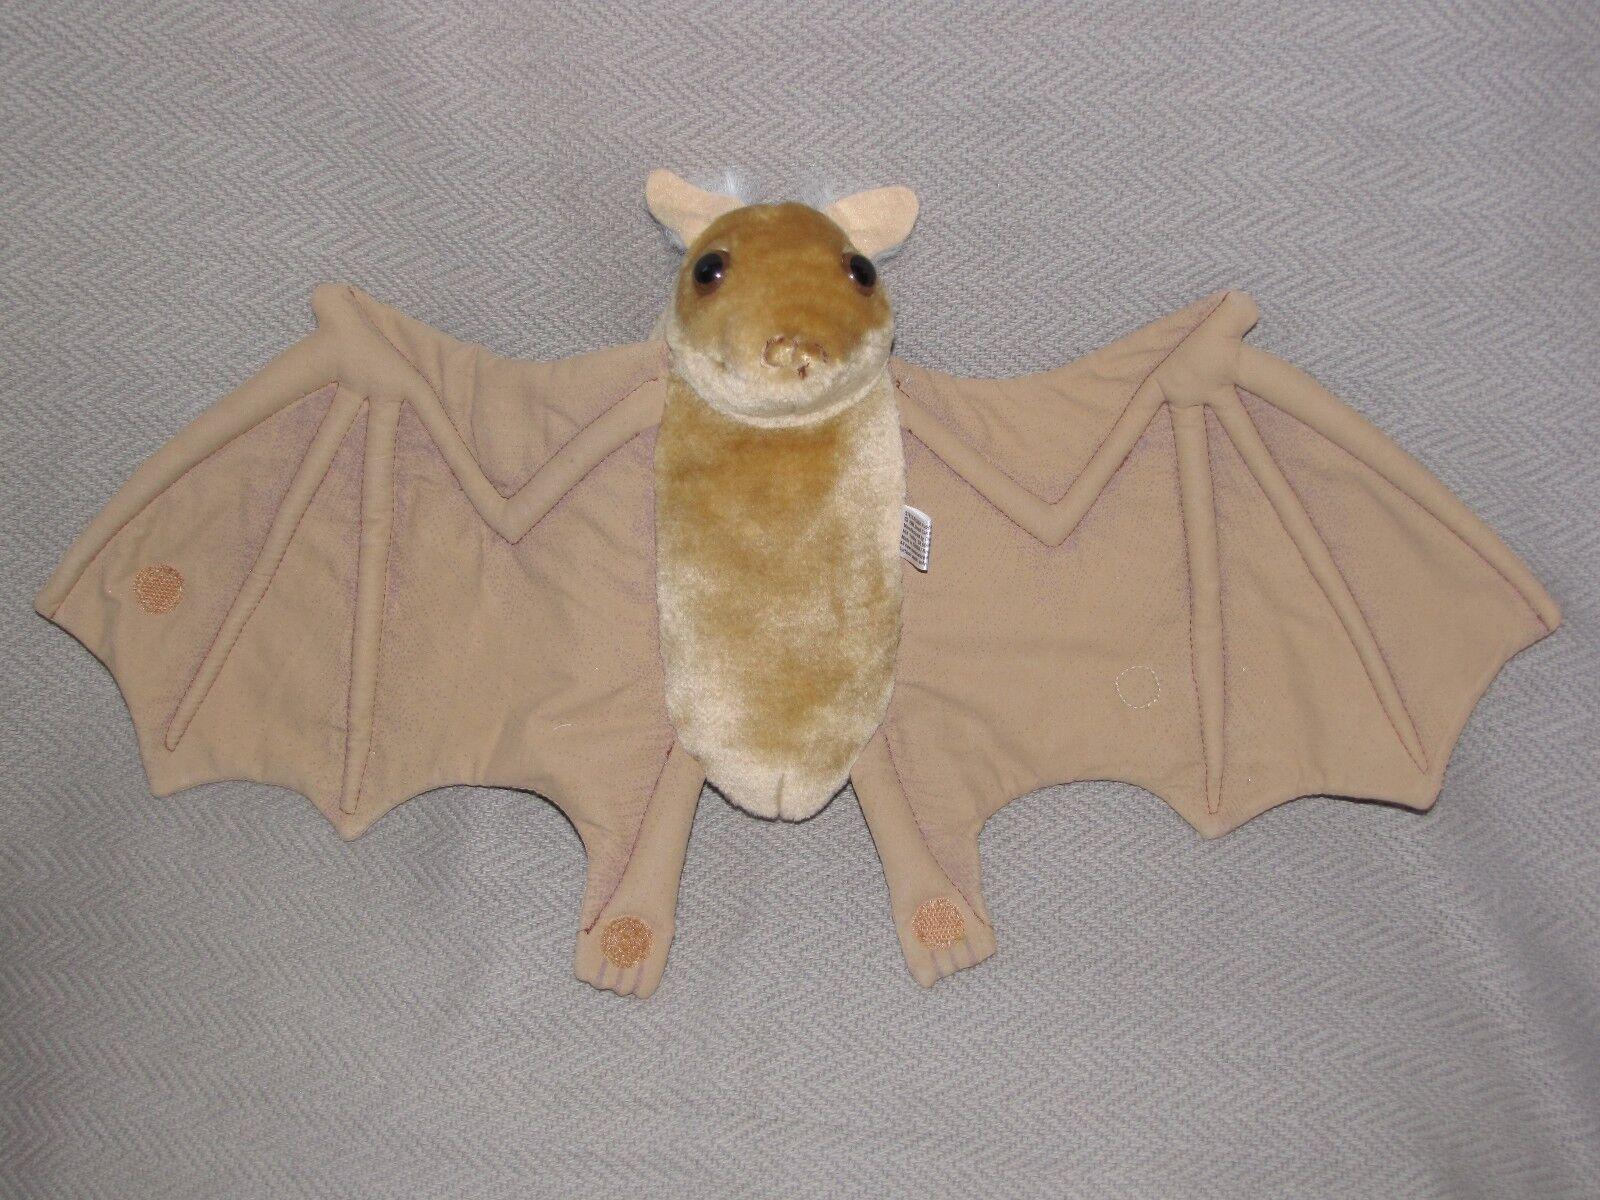 Vtg VHTF 1996 Stellaluna Plush Bat Puppet Janell Cannon 10 X20  WINGSPAN